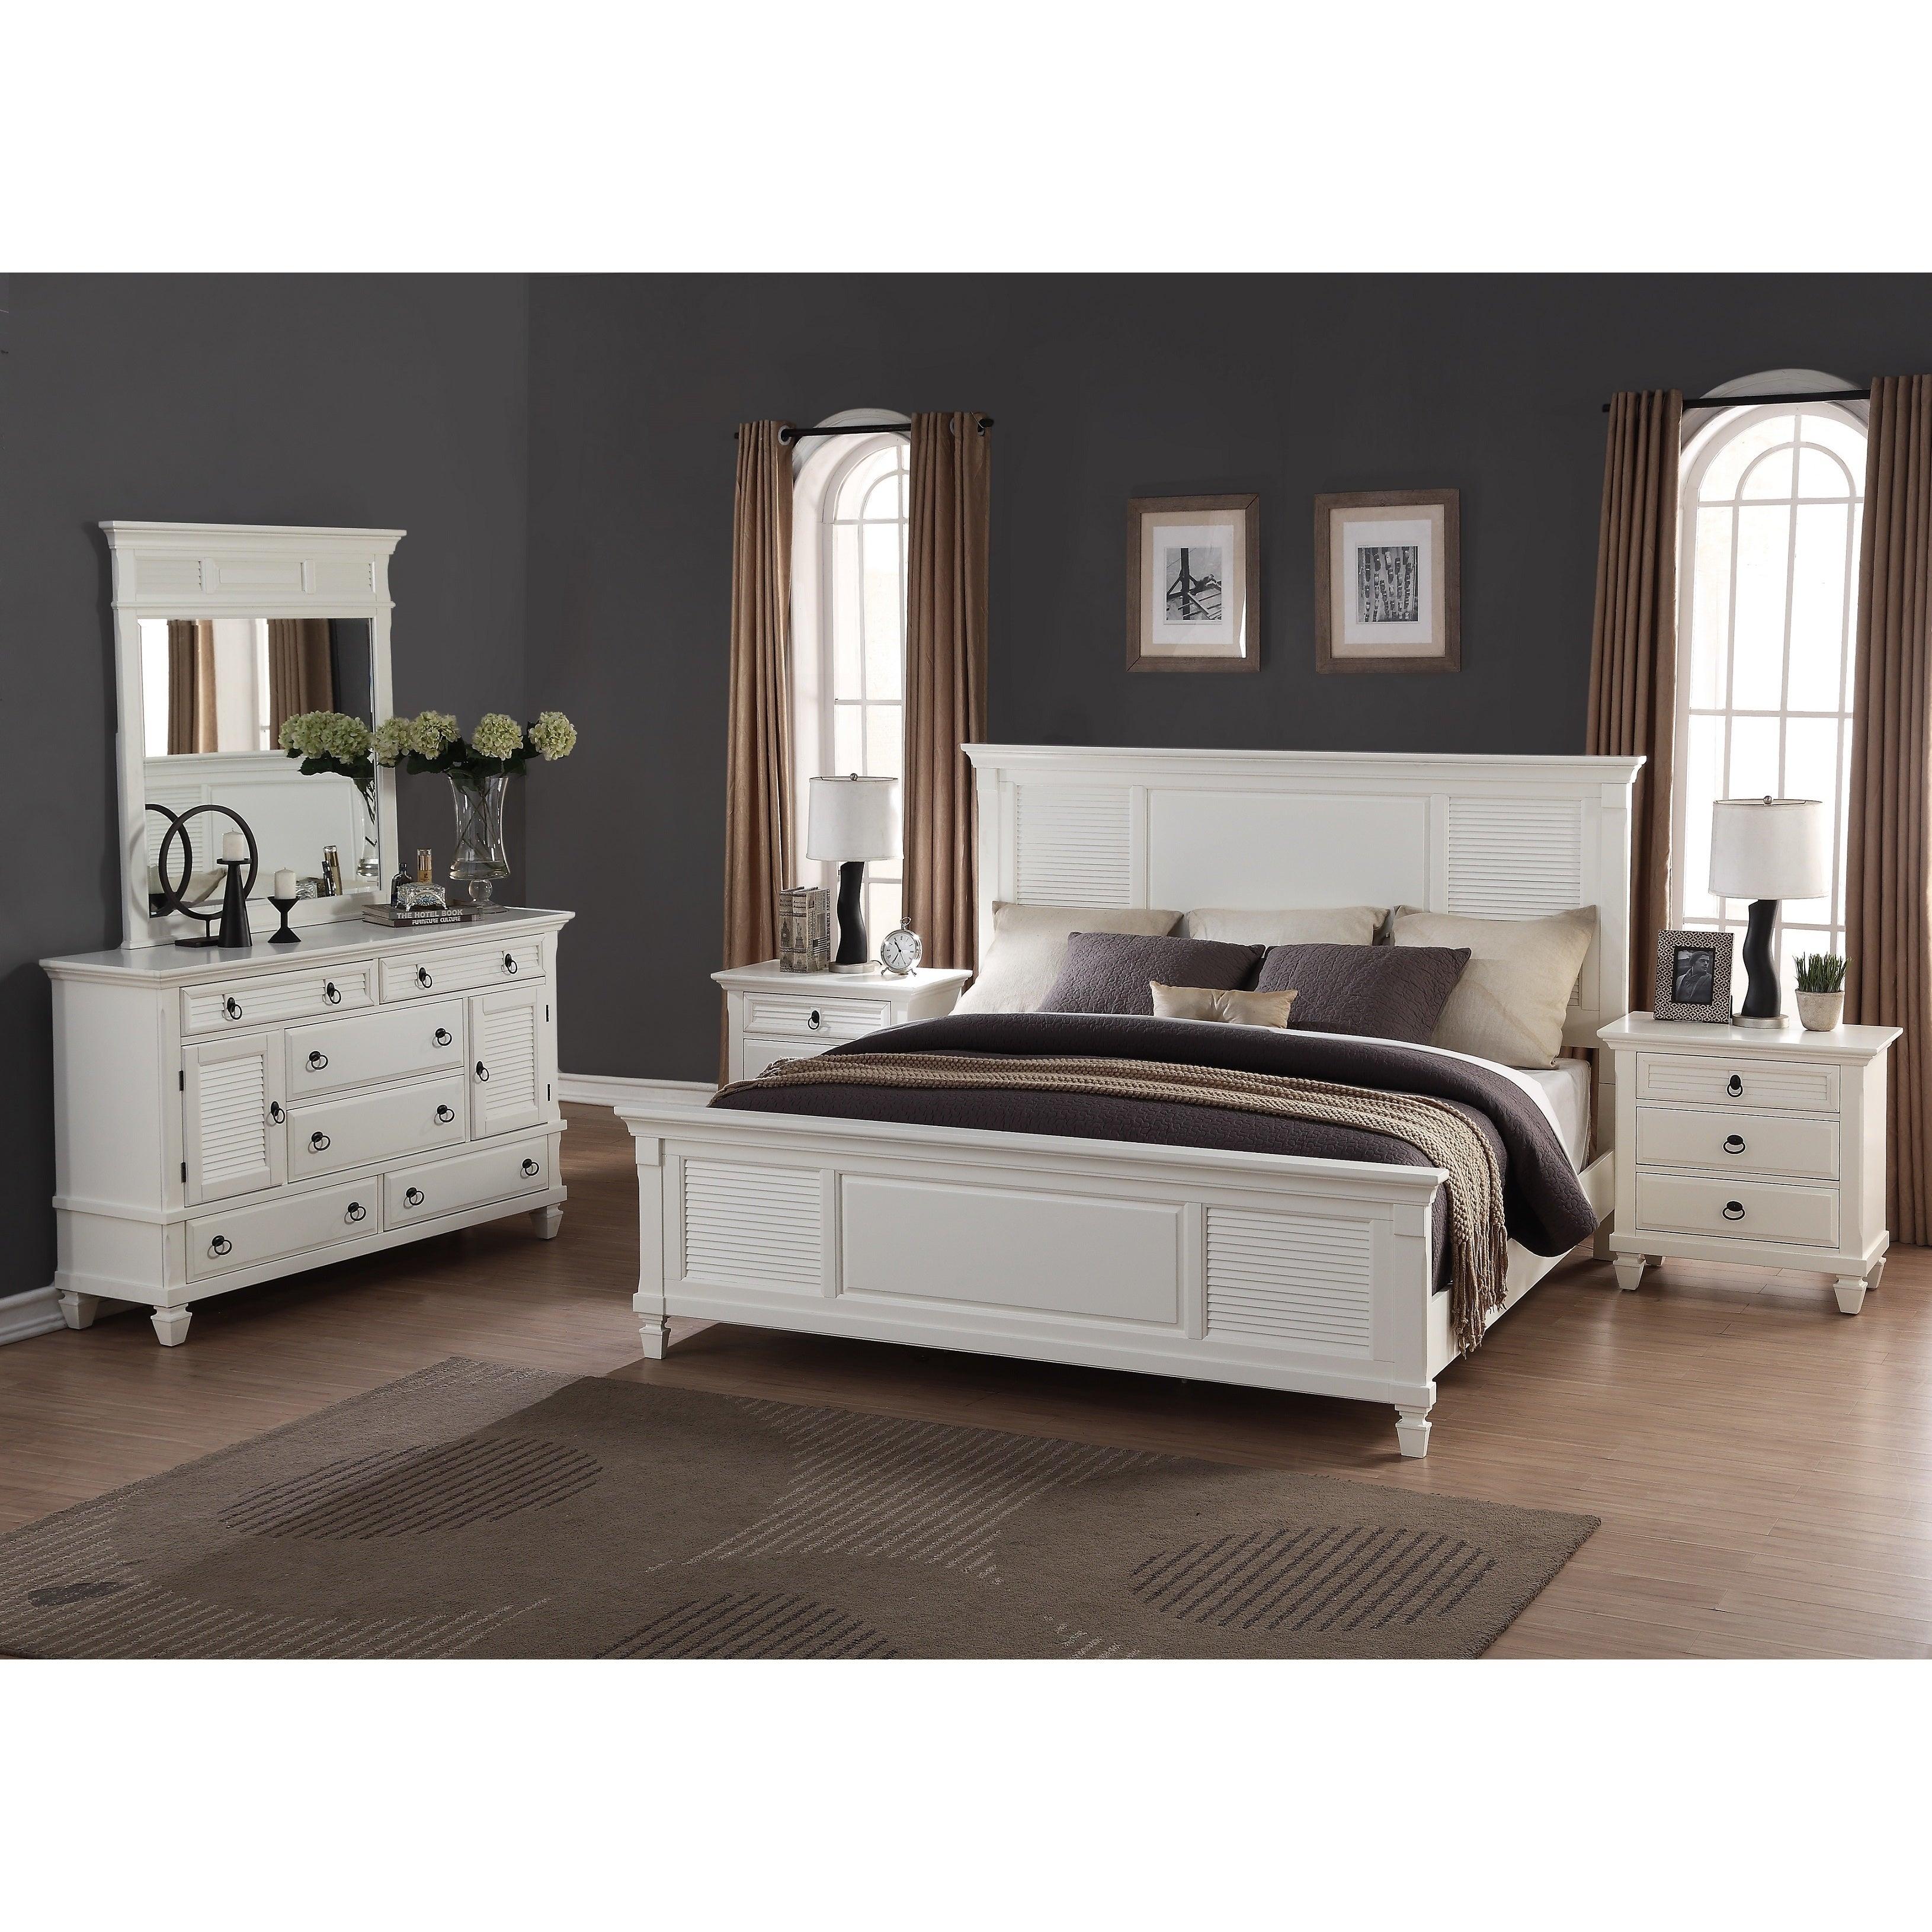 Image of: Shop Black Friday Deals On Regitina White 5 Piece Queen Size Bedroom Furniture Set Overstock 12602051